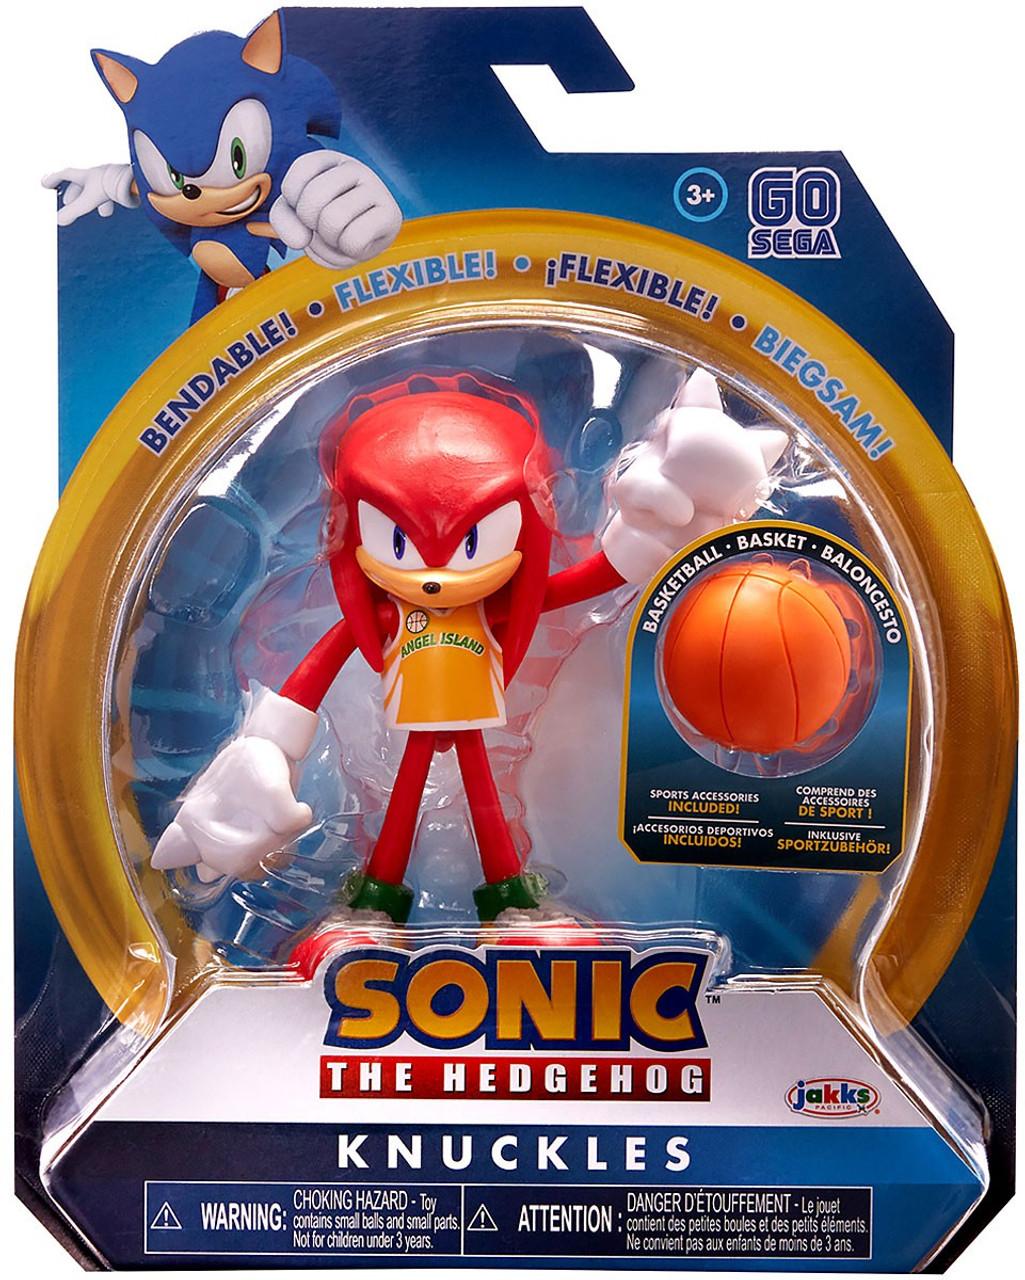 Sonic The Hedgehog Basic Series 3 Basketball Knuckles 4 Action Figure Jakks Pacific Toywiz